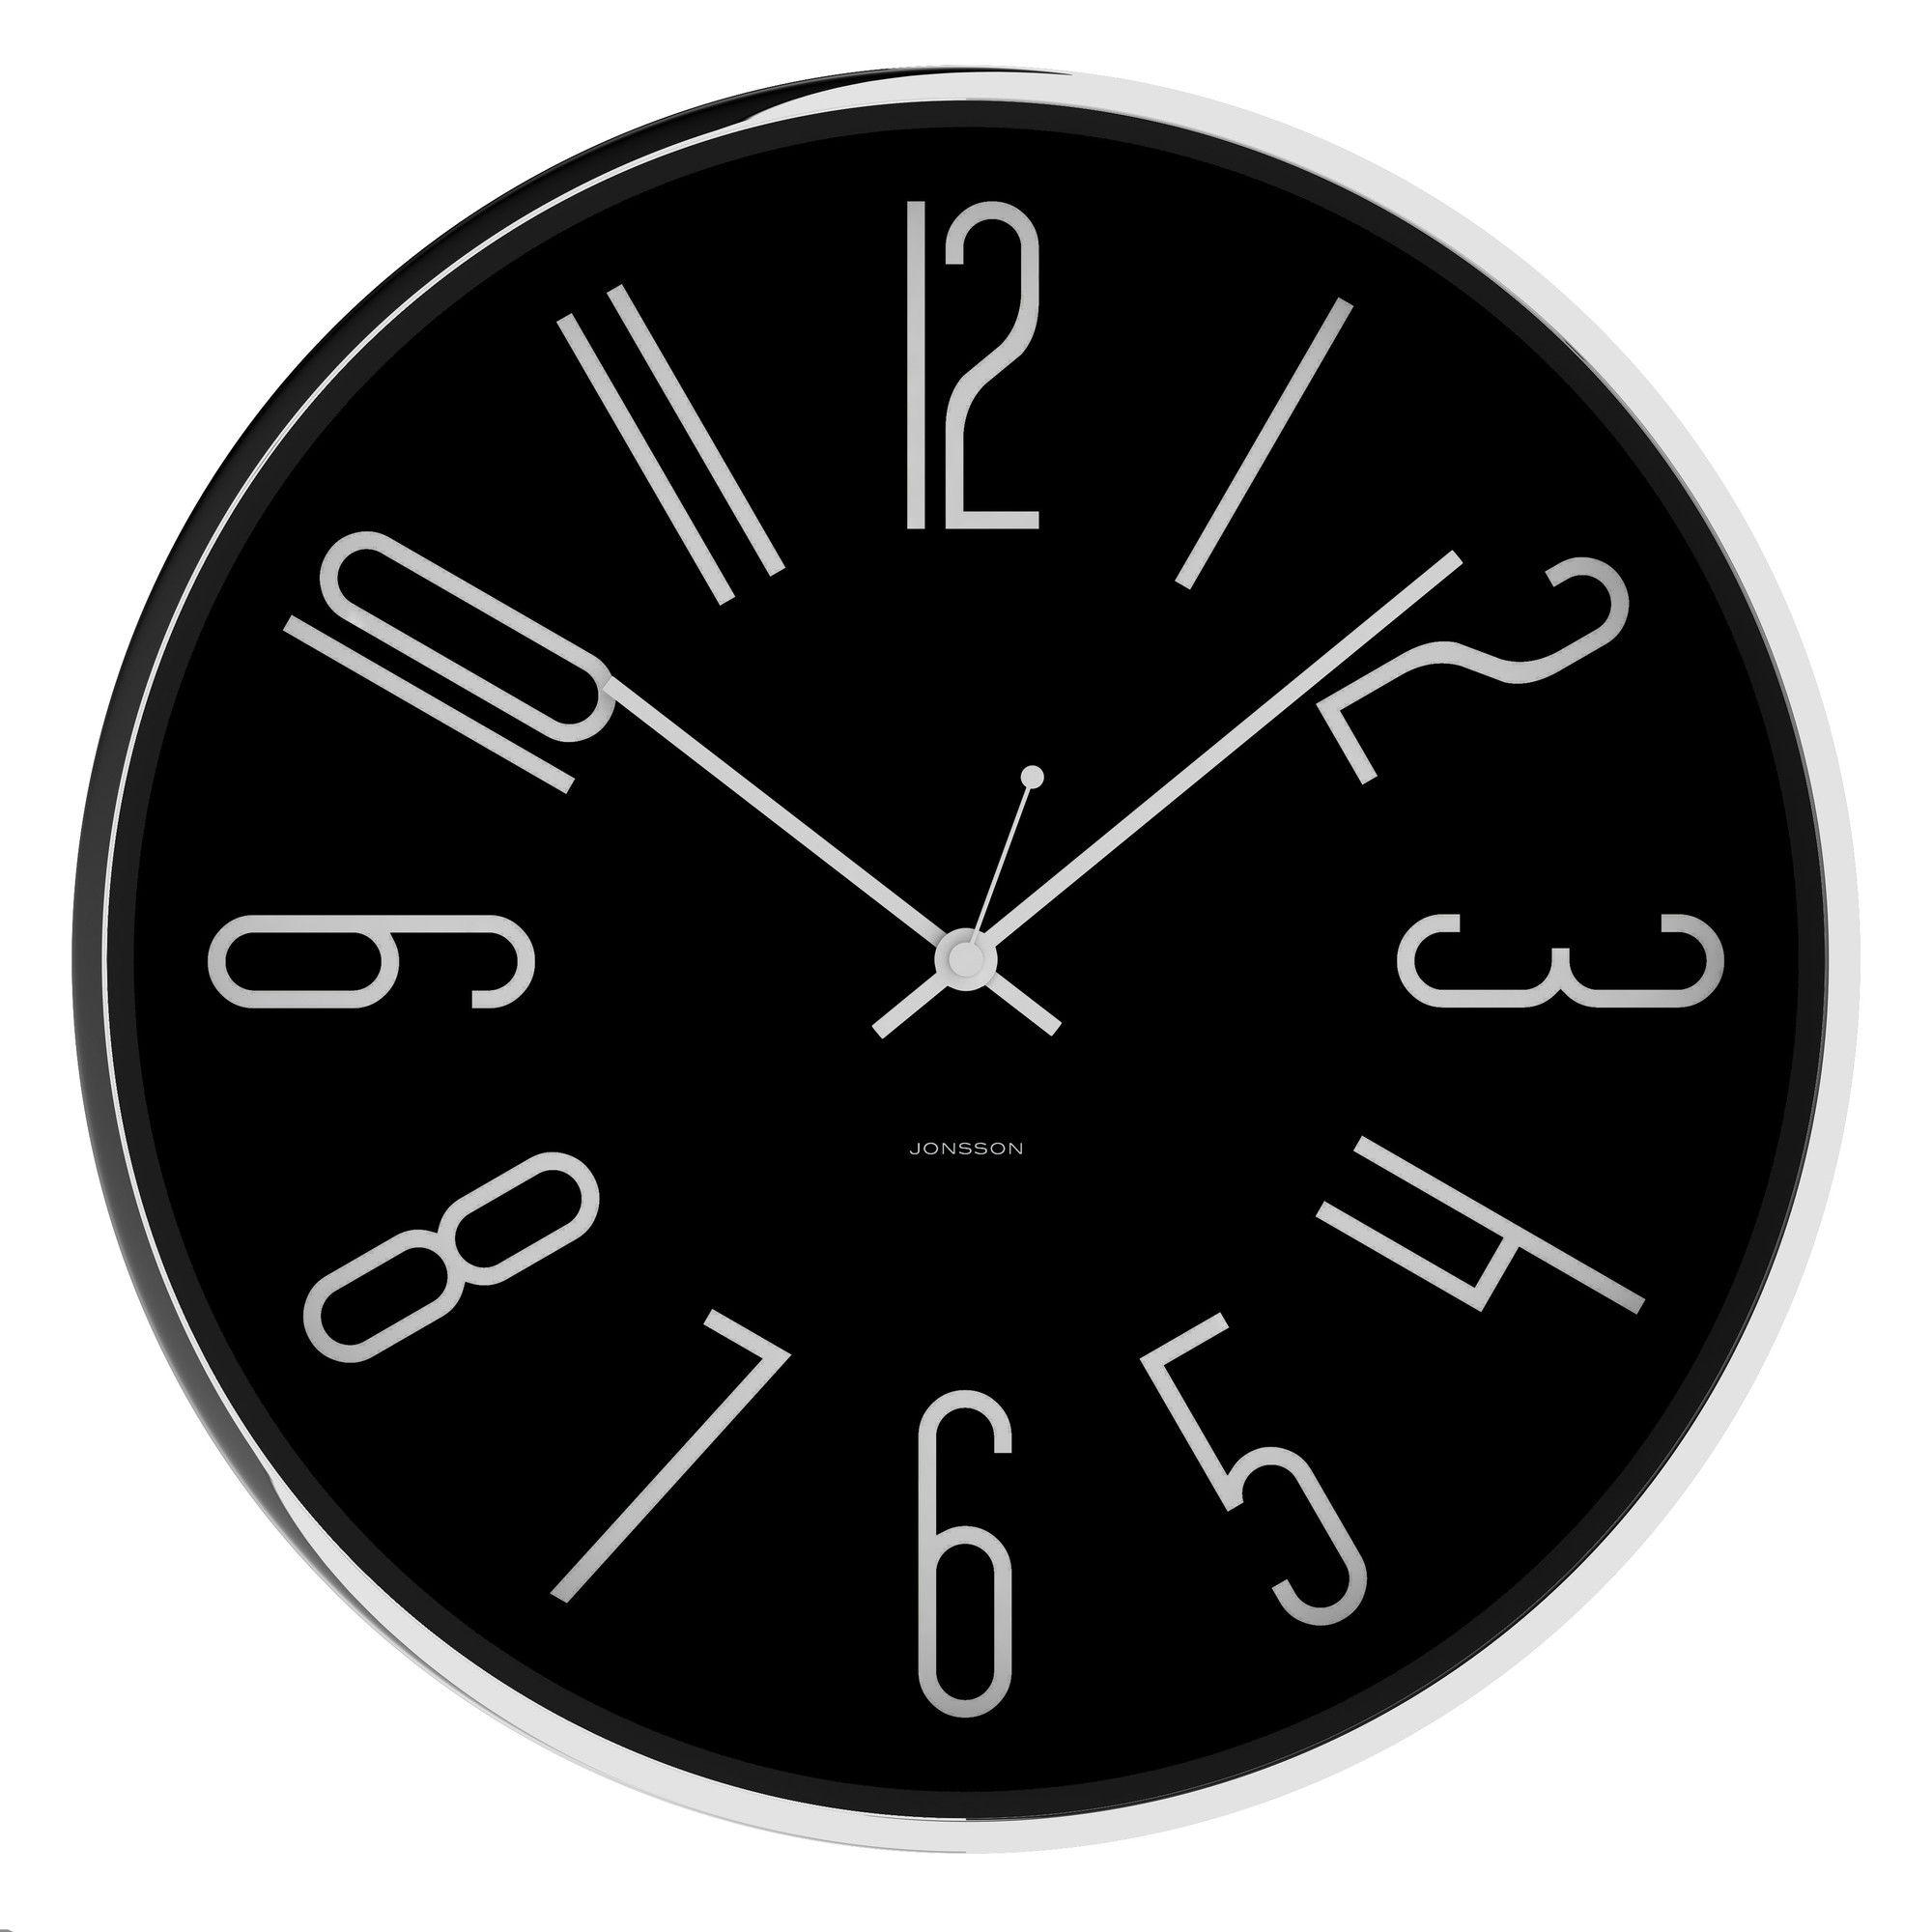 Asger Wall Clock Products Pinterest Wall Clocks Clocks And Walls